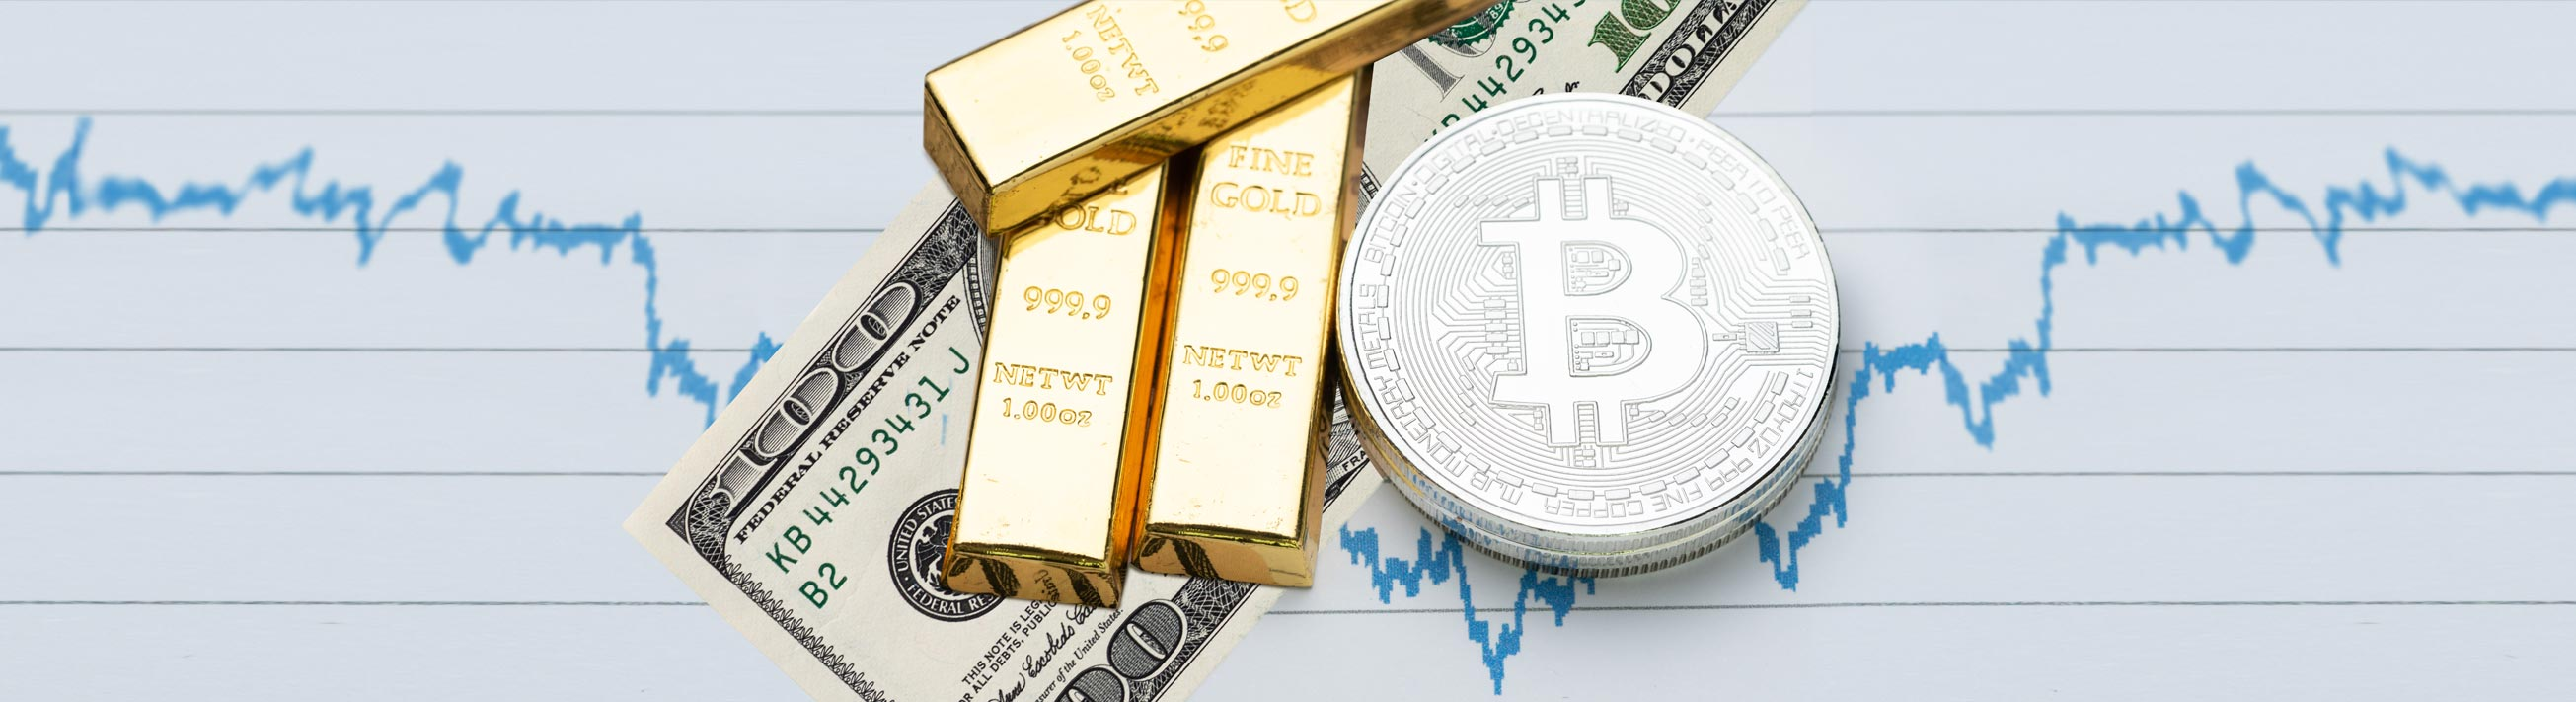 bitcoin sebagai aset safe haven